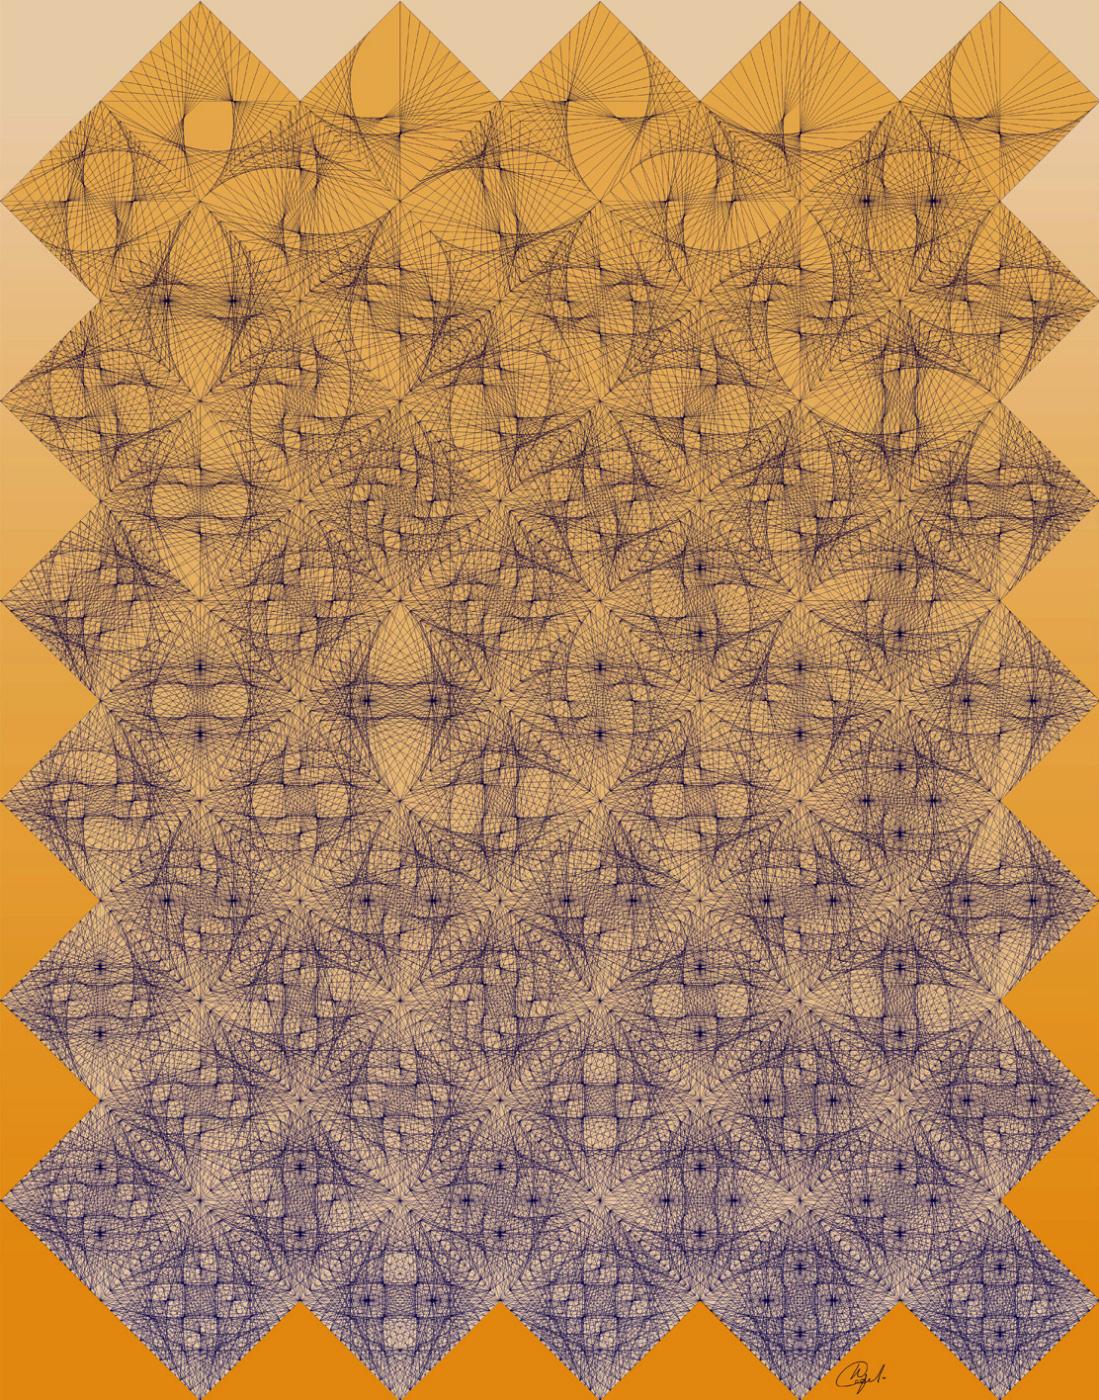 Юрий Николаевич Сафонов (Yury Safonov). Caustics inside the square series (combinatorics)